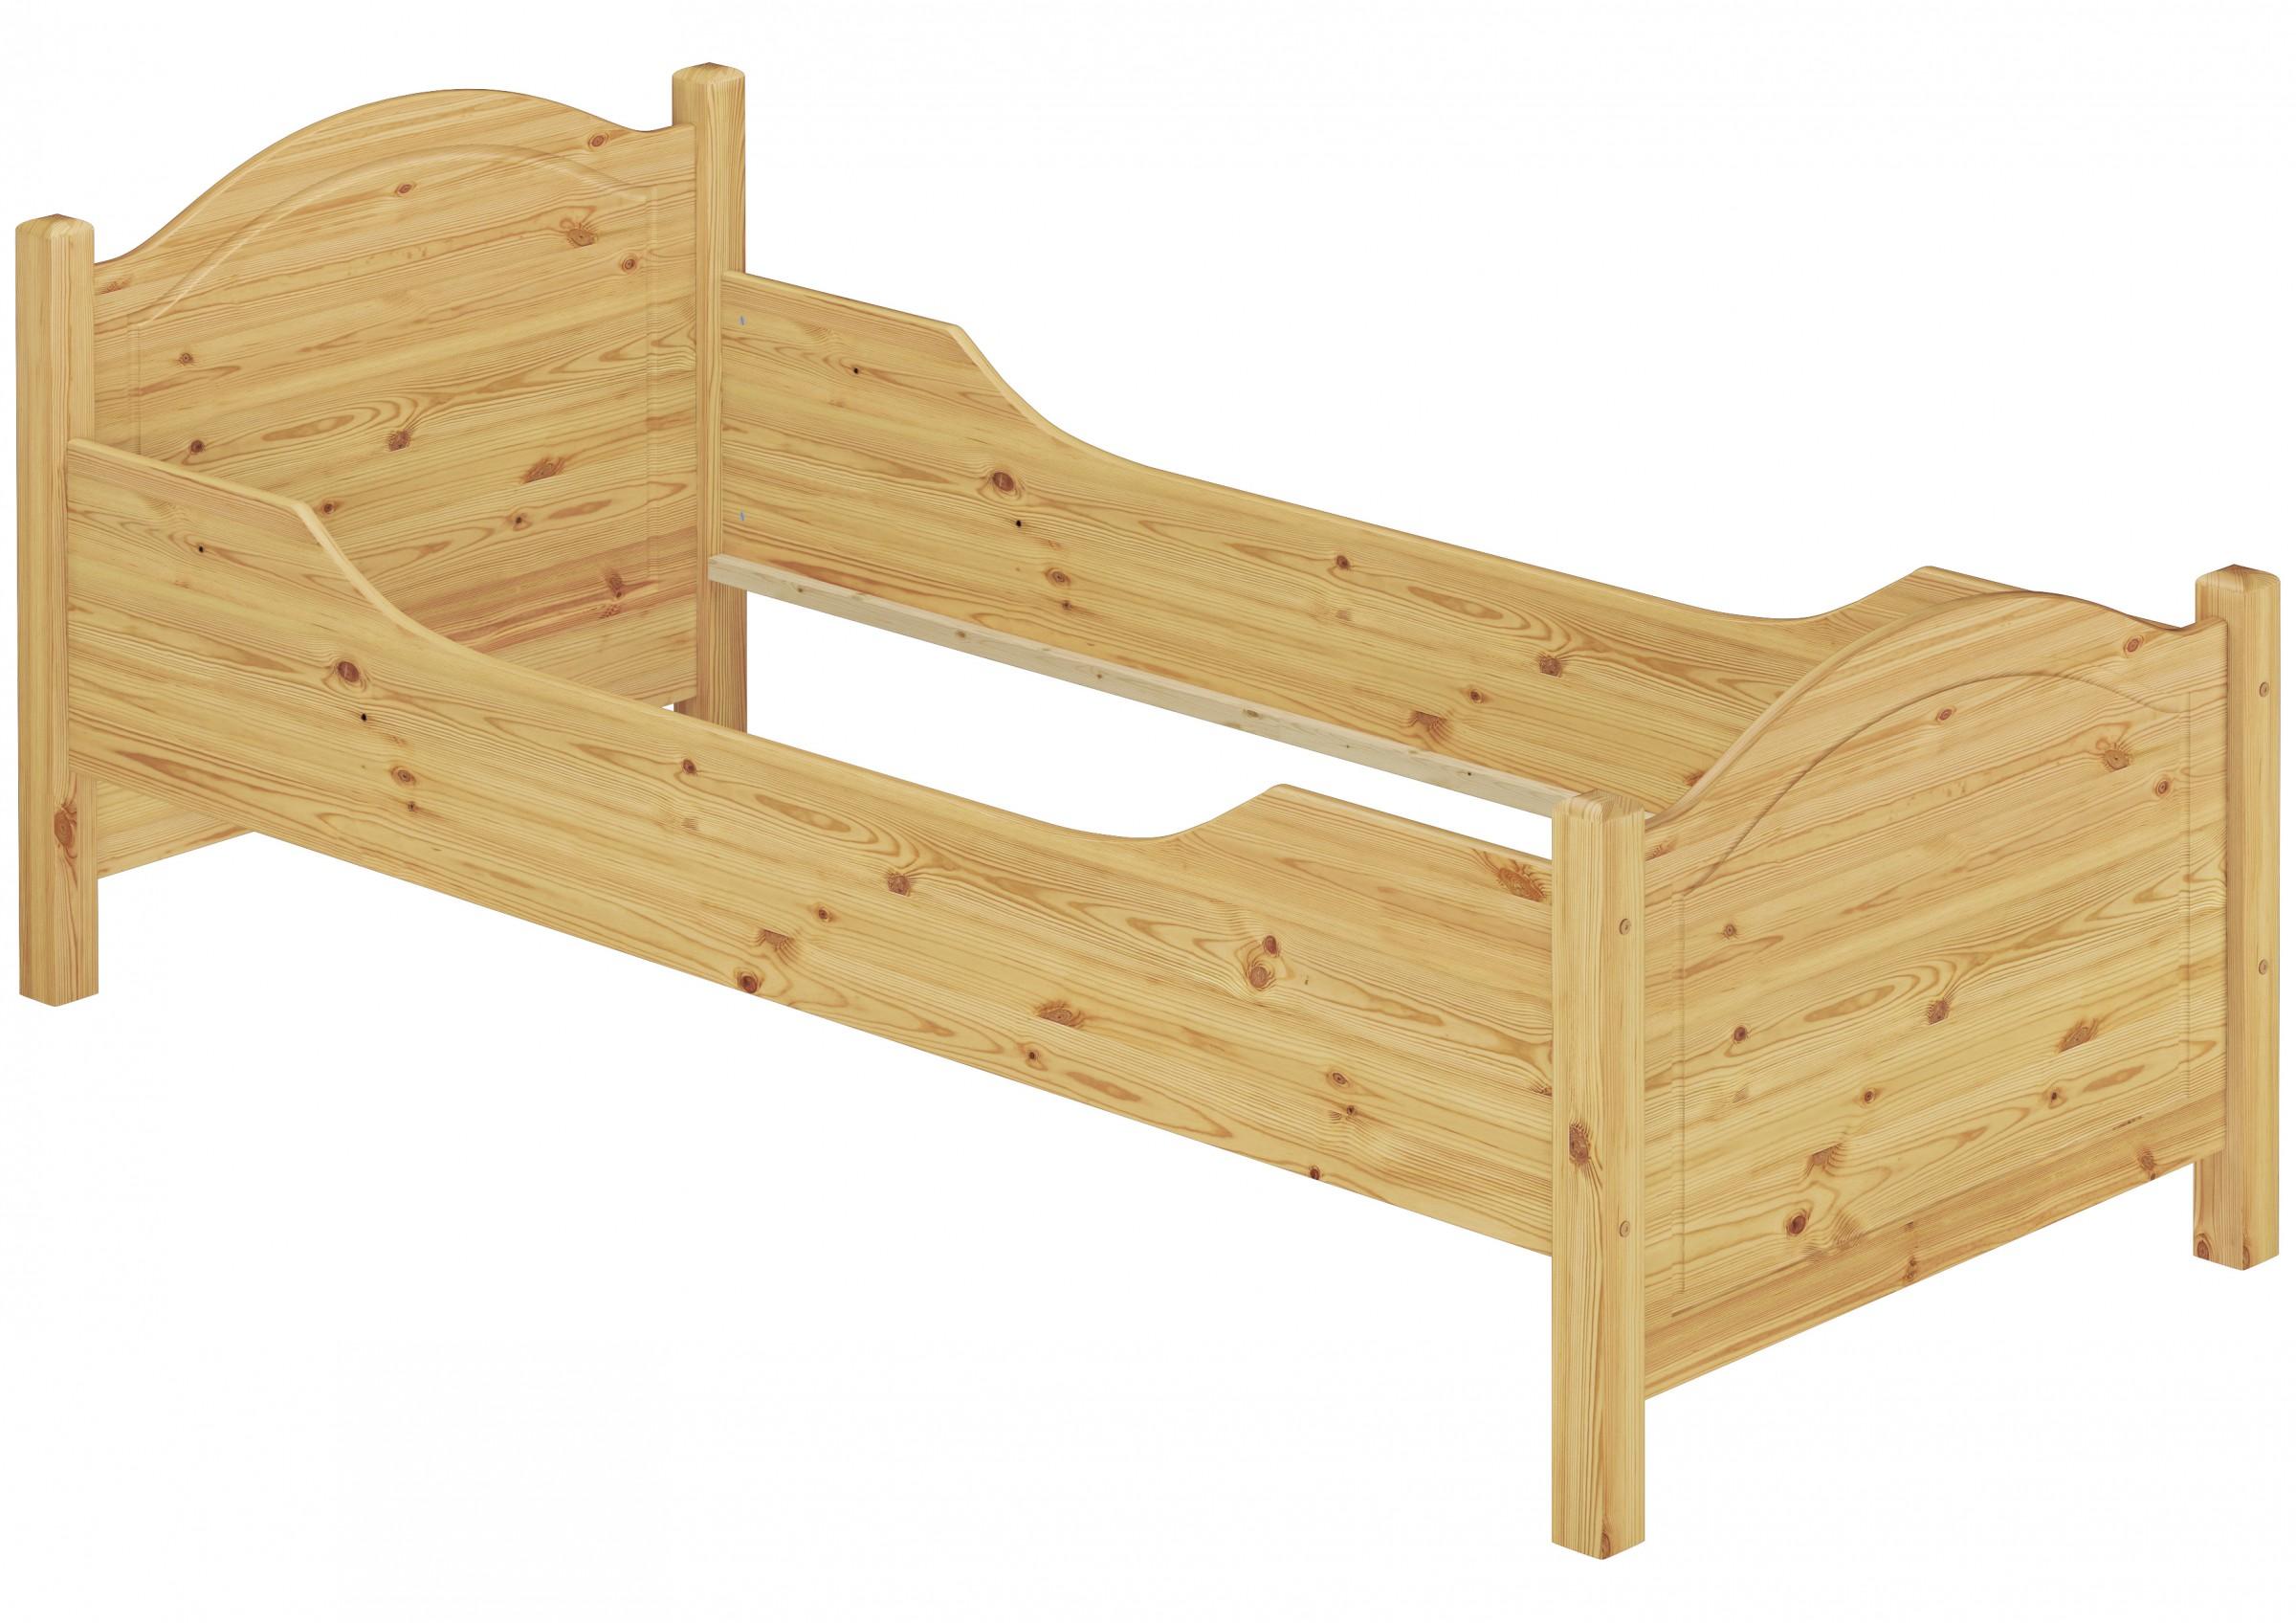 seniorenbett extra hoch 90x200 einzelbett g stebett kiefer massiv or ebay. Black Bedroom Furniture Sets. Home Design Ideas